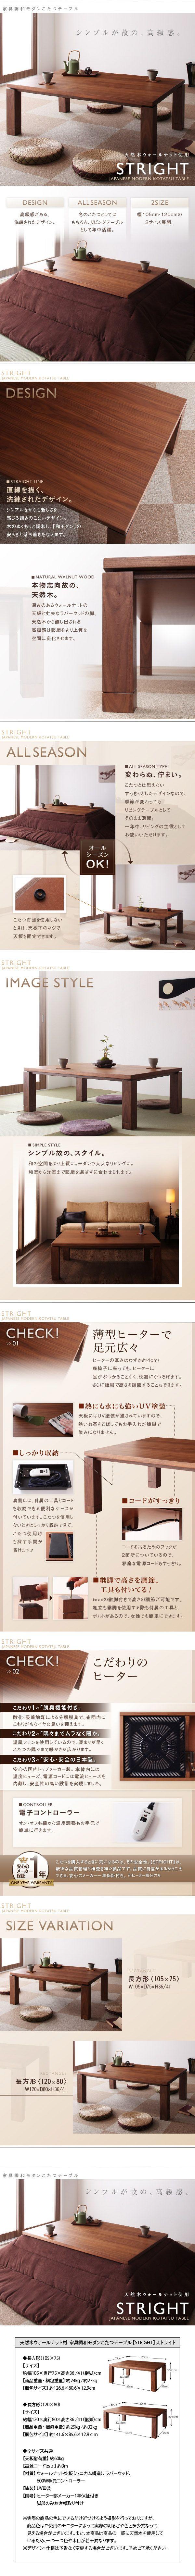 [rdn]STRIGHT natural tree kotatsu table/120x80 grain: Real Yahoo auction salling